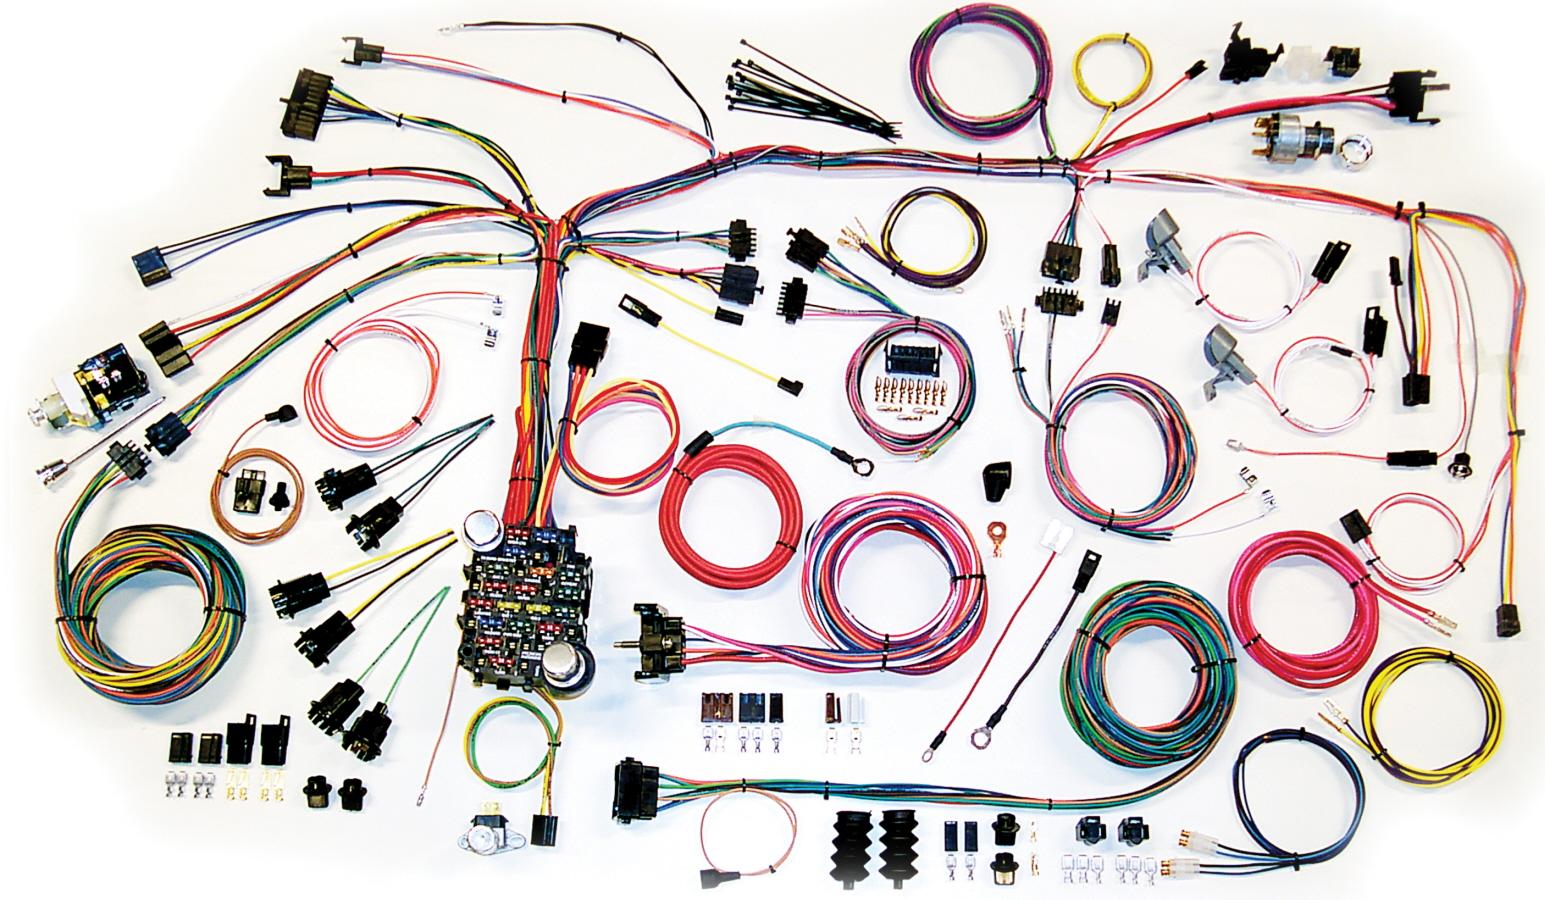 67 camaro wiring harness